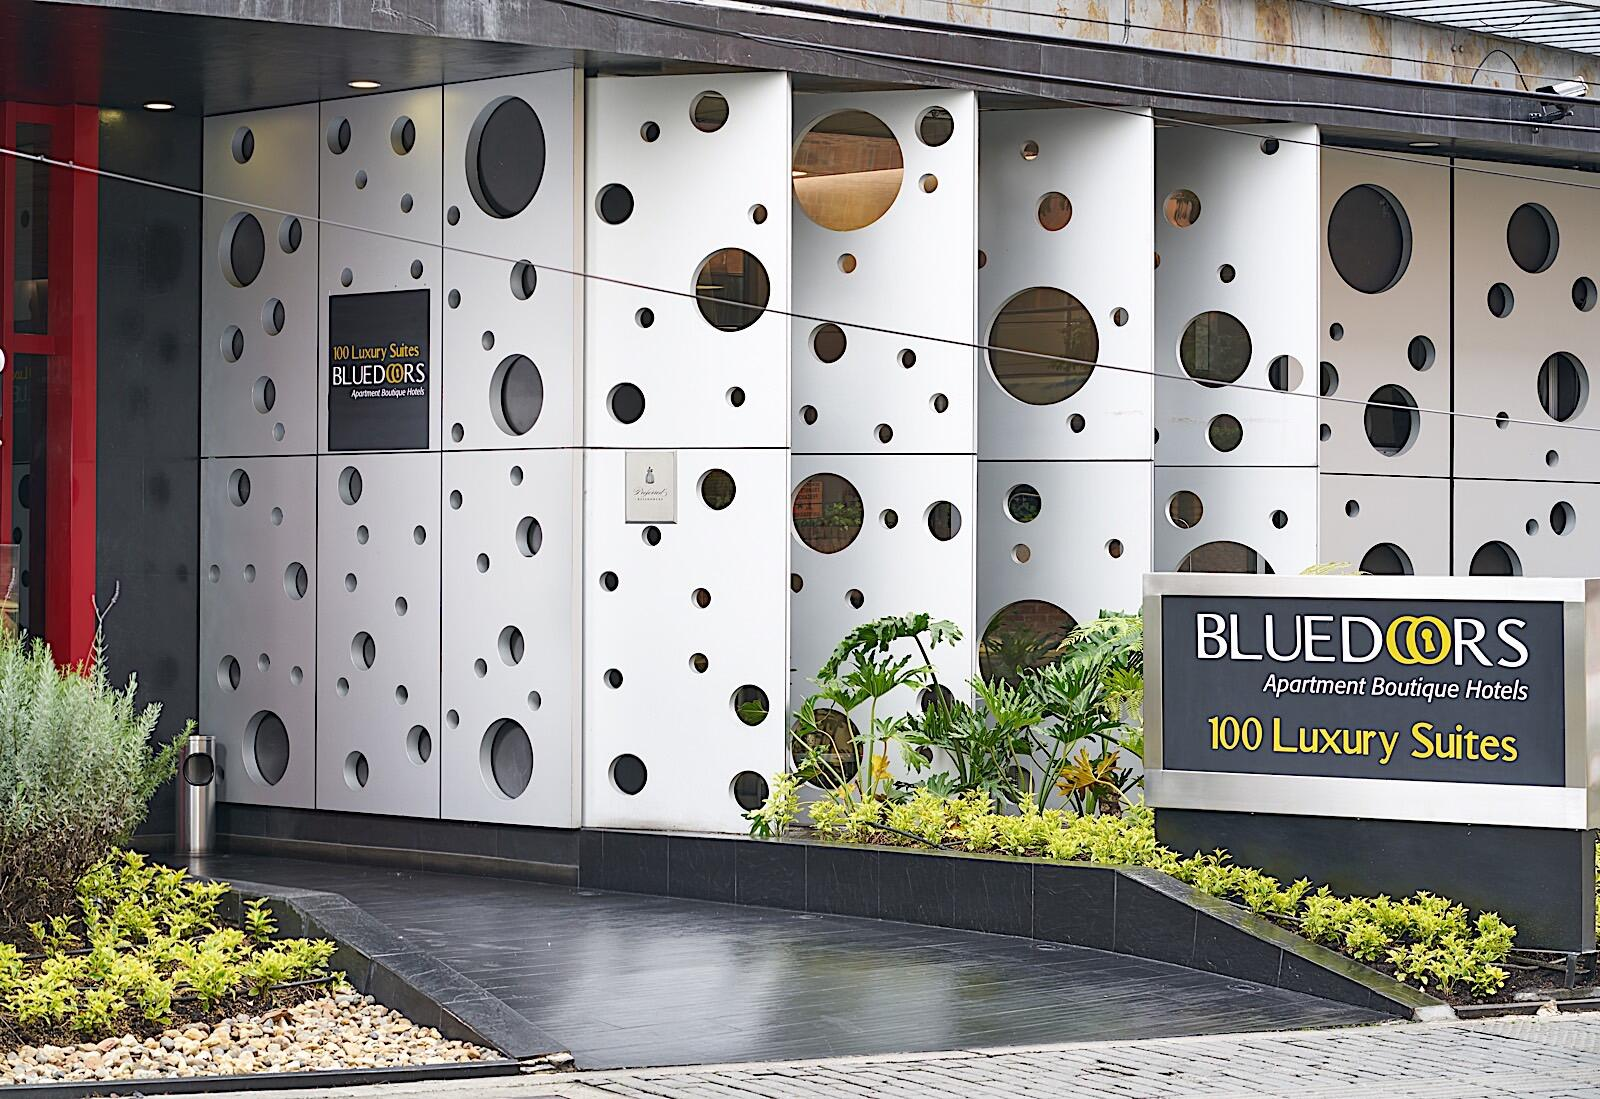 Exterior of Bluedoors Apartahotel 100 Luxury Suites